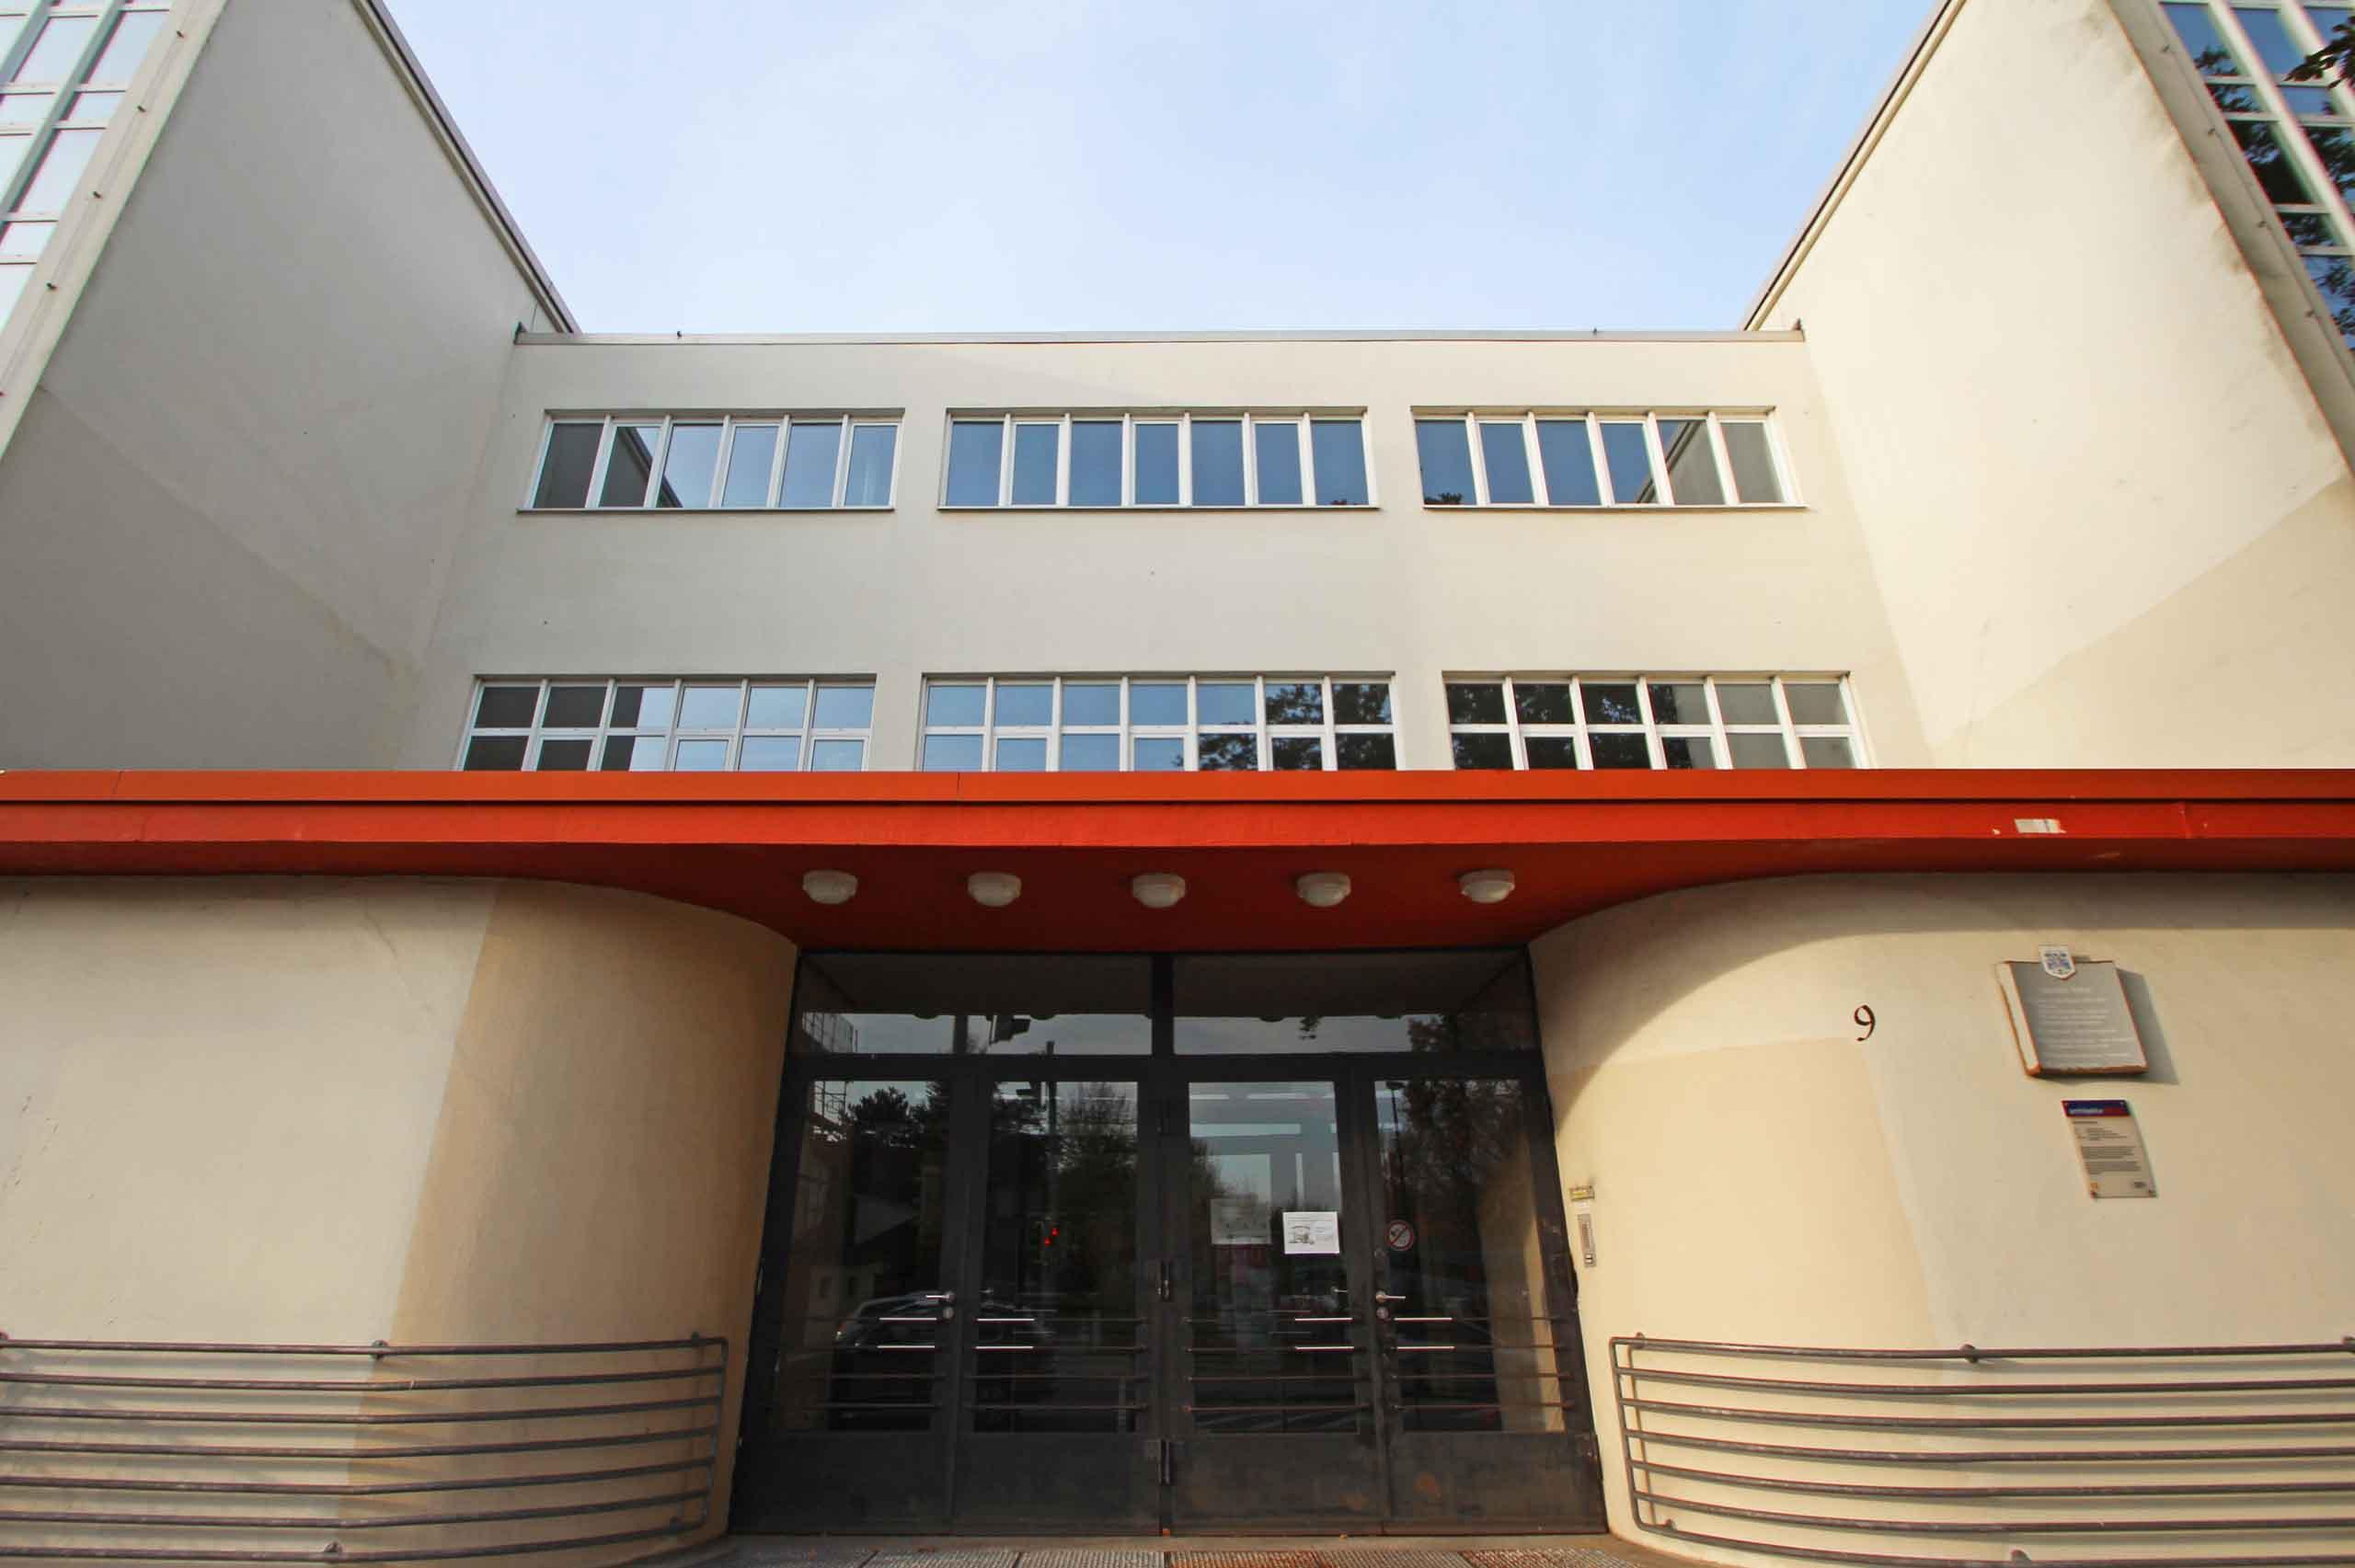 Altstädter Schule in Celle, Eingang